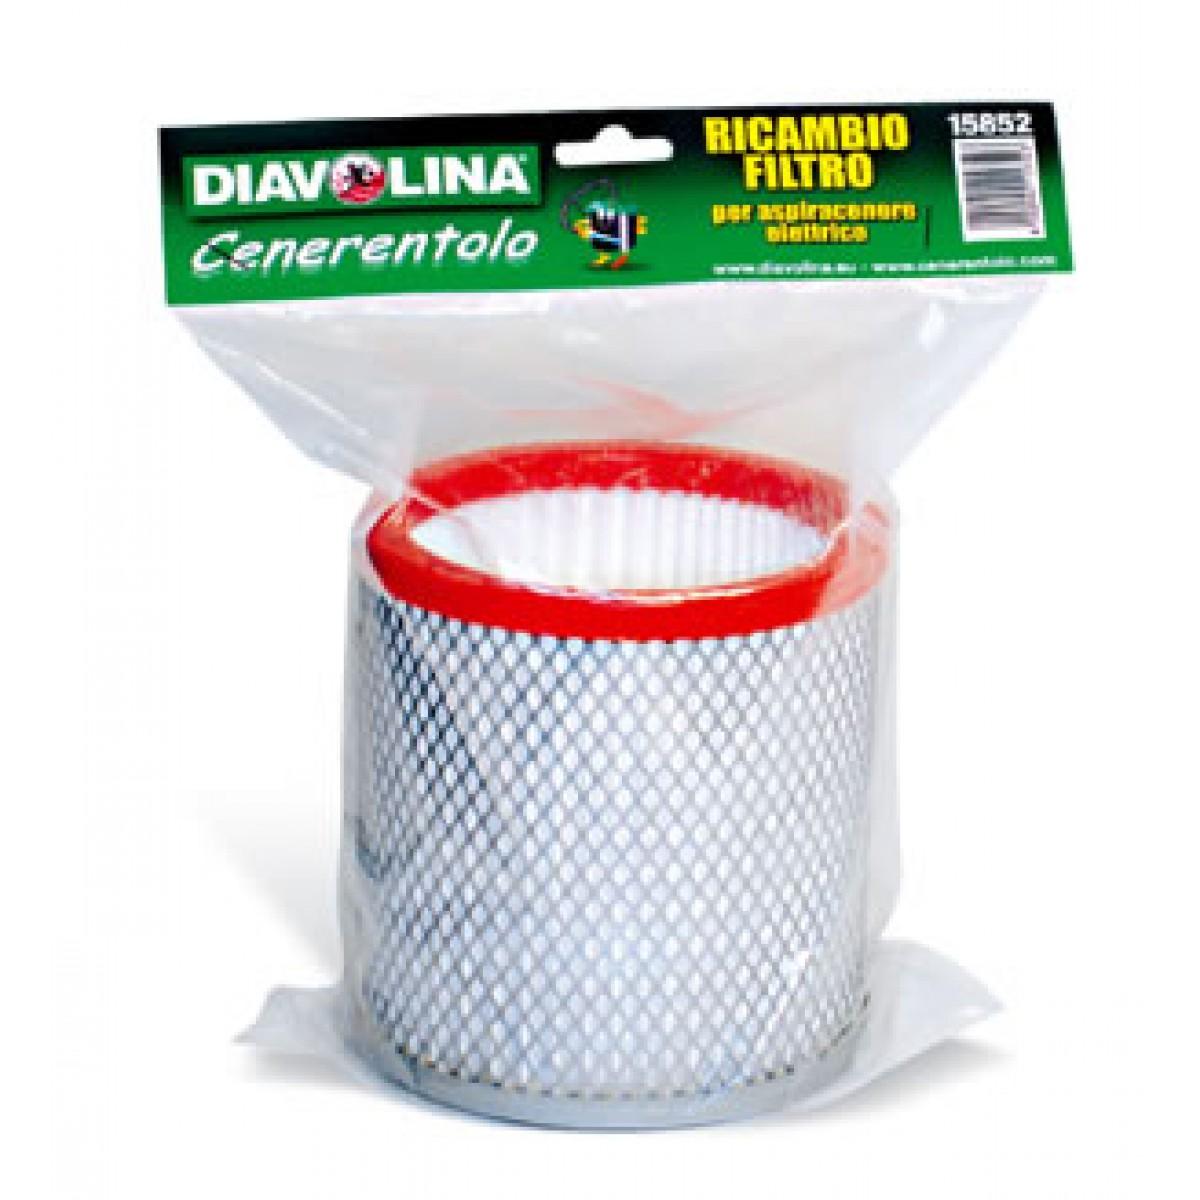 Aspirateur cendre cenerentolo diavolina v146 bidon - Aspirateur cendre pellet ...